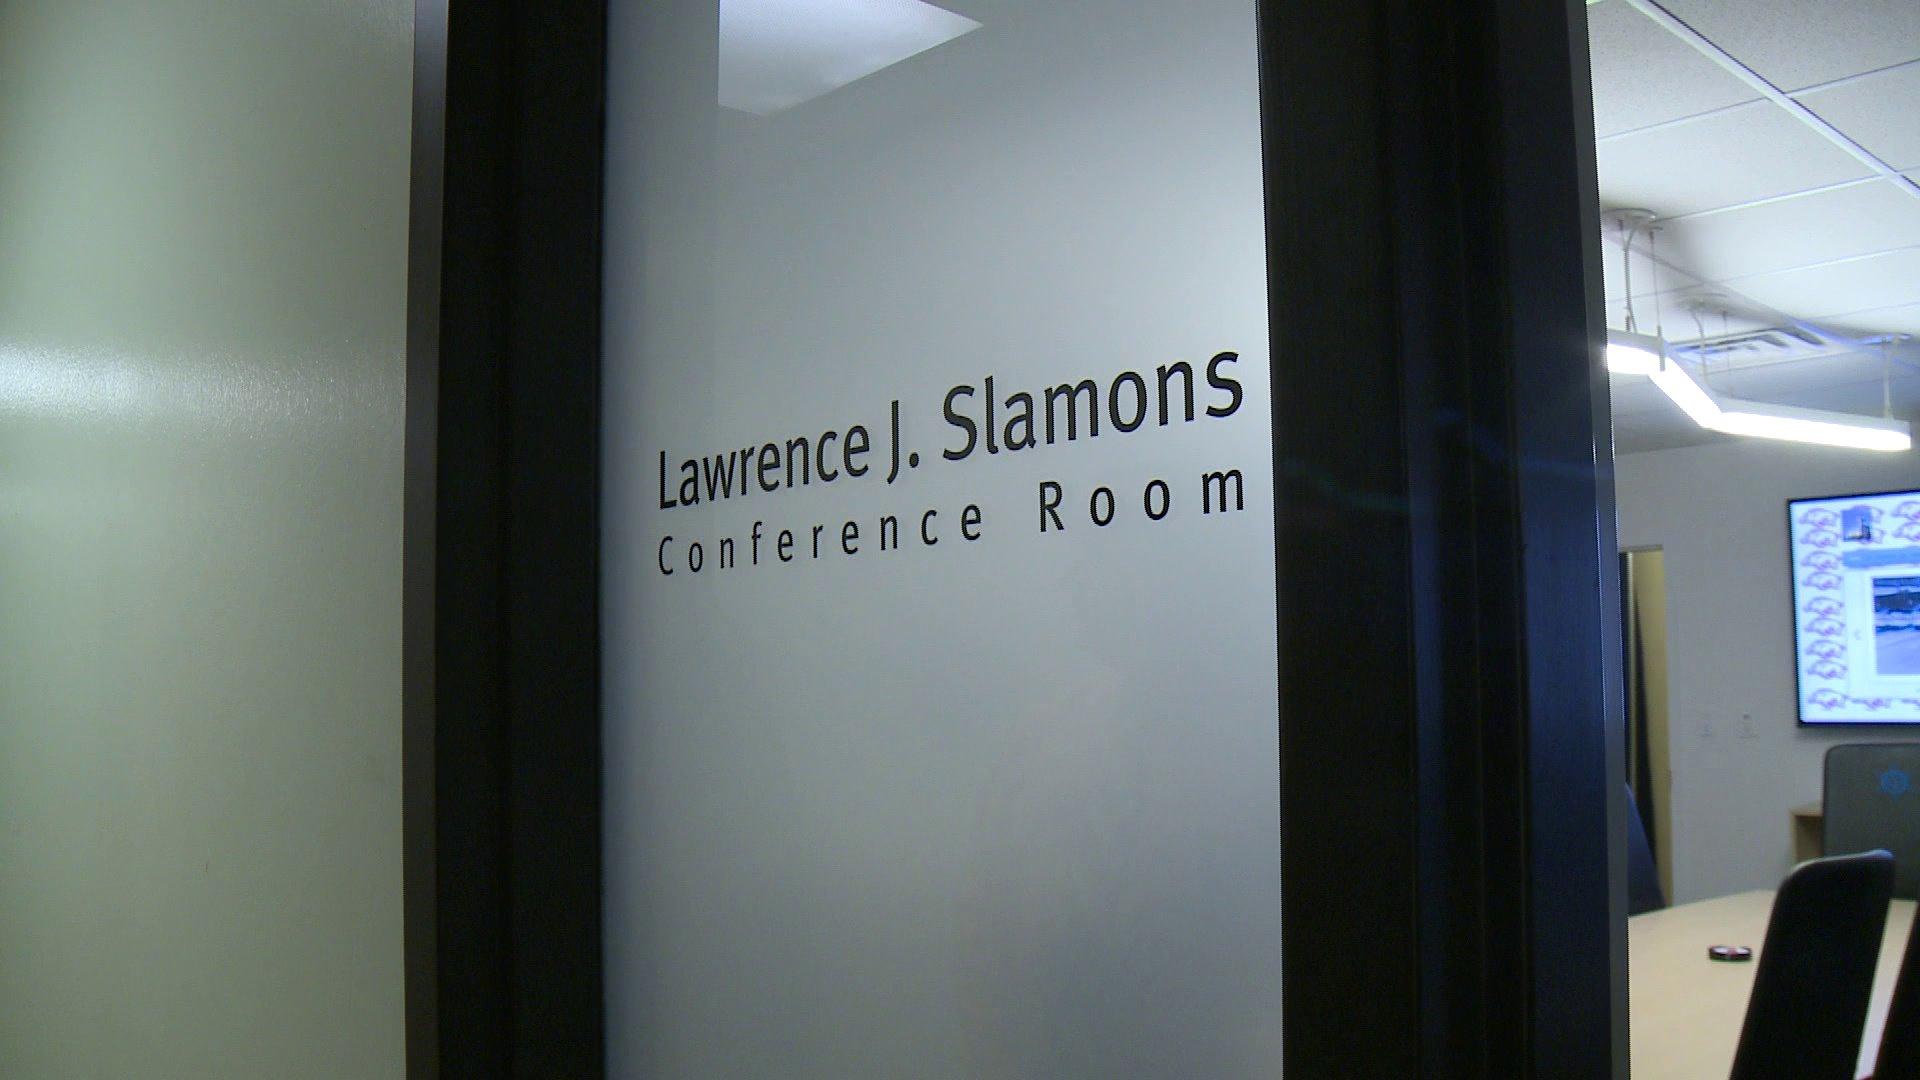 larry-slamons-conference-room-uapd